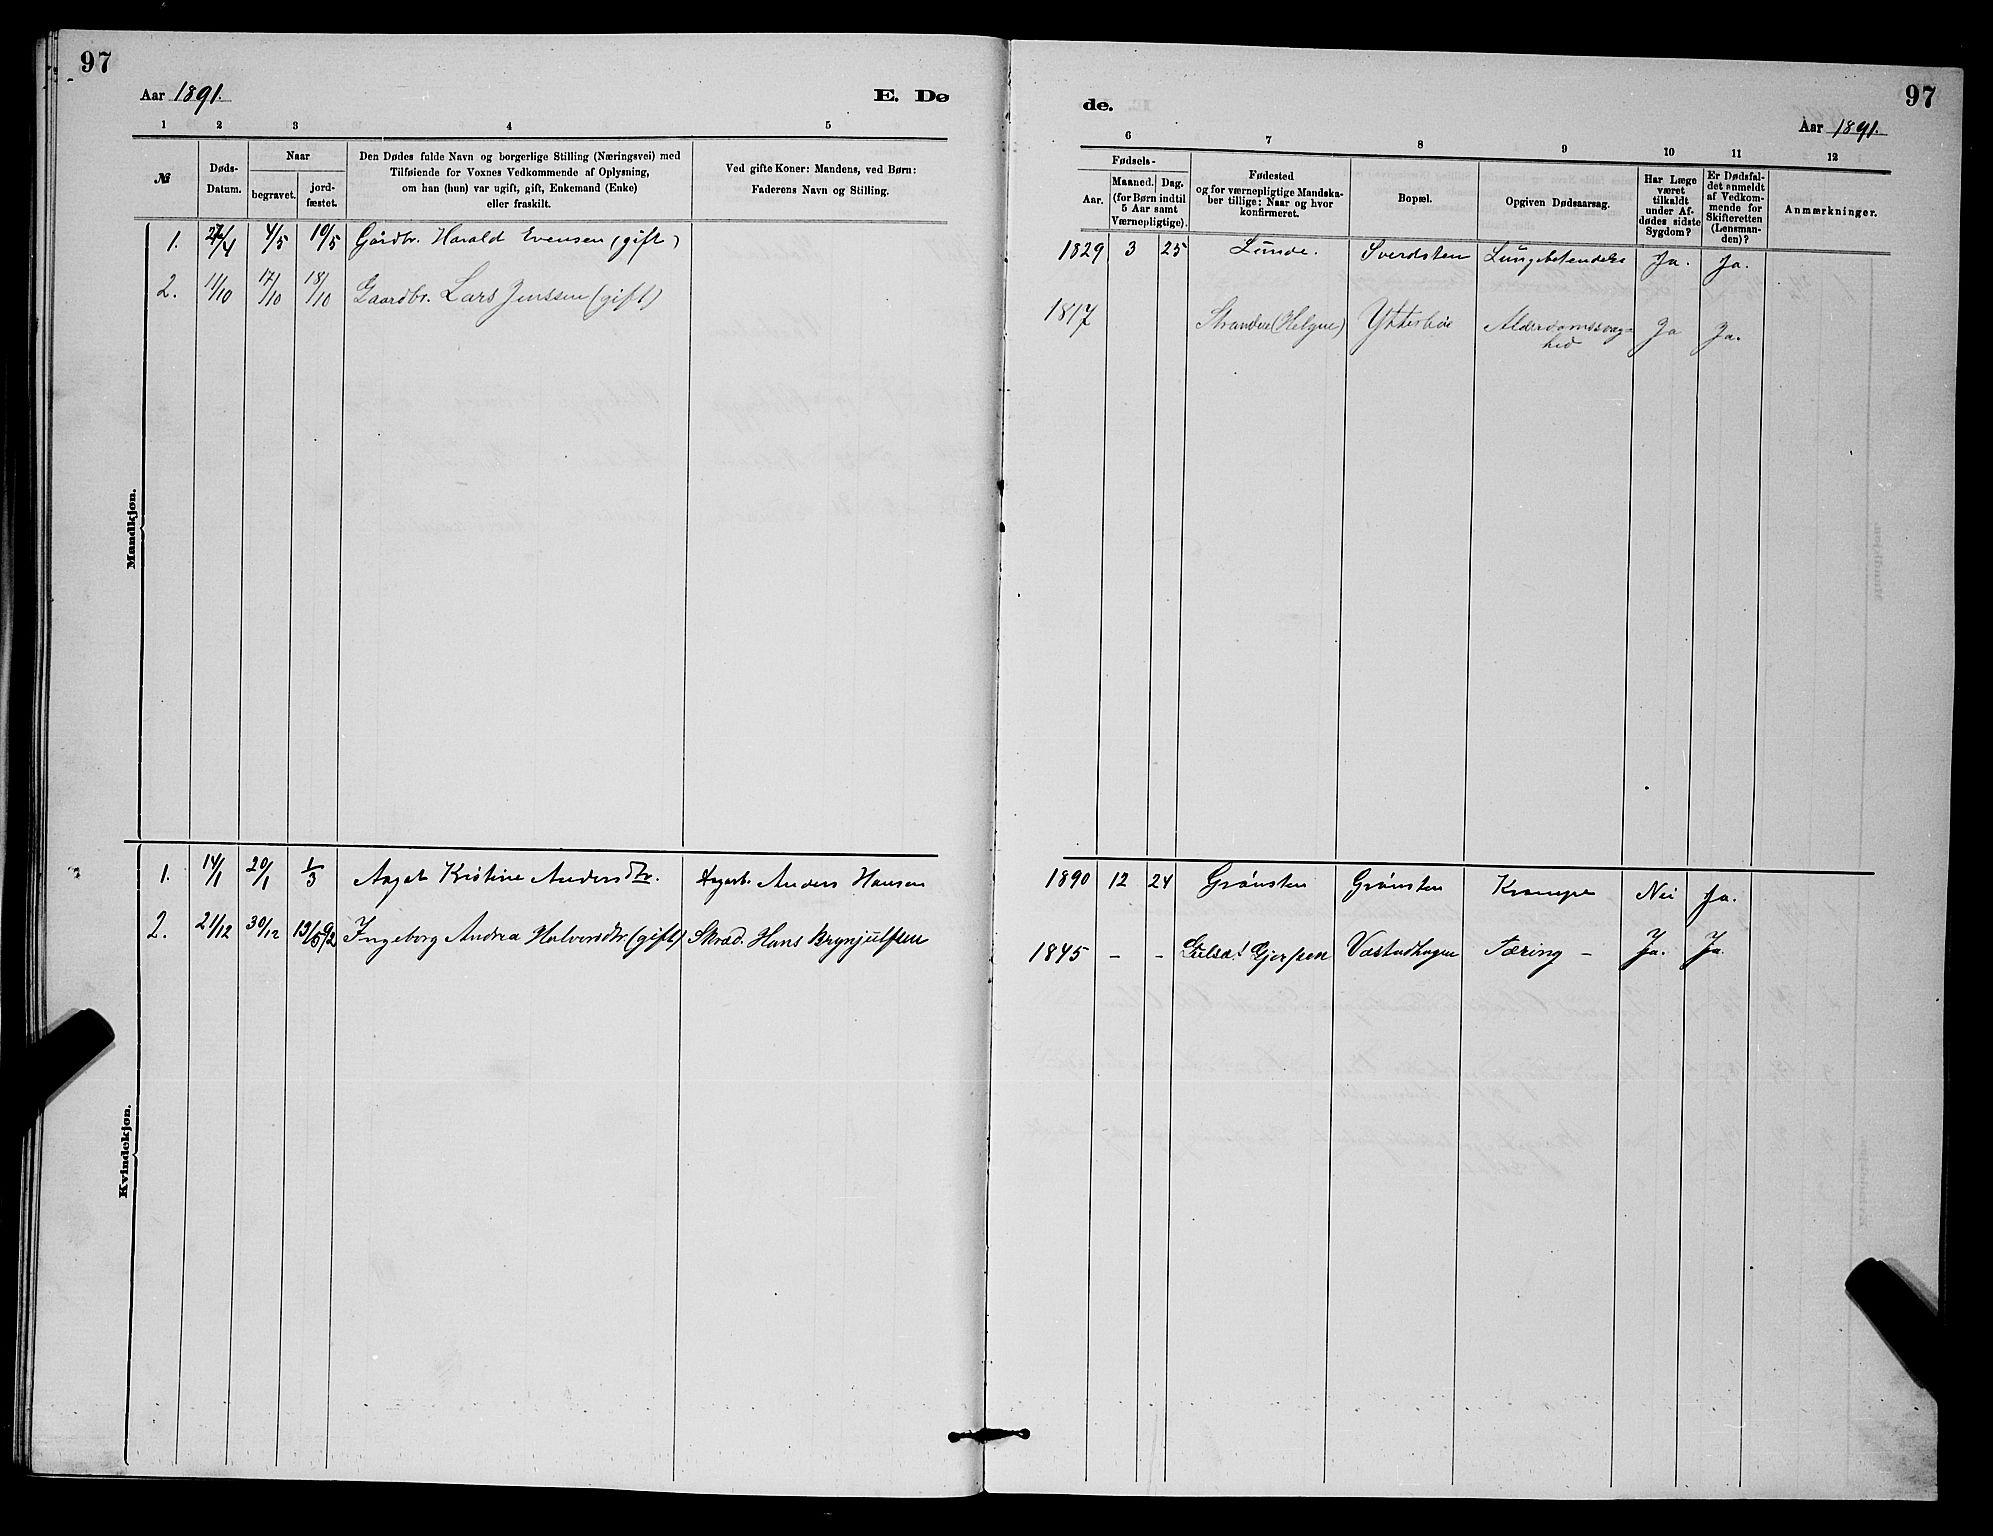 SAKO, Holla kirkebøker, G/Gb/L0001: Klokkerbok nr. II 1, 1882-1897, s. 97